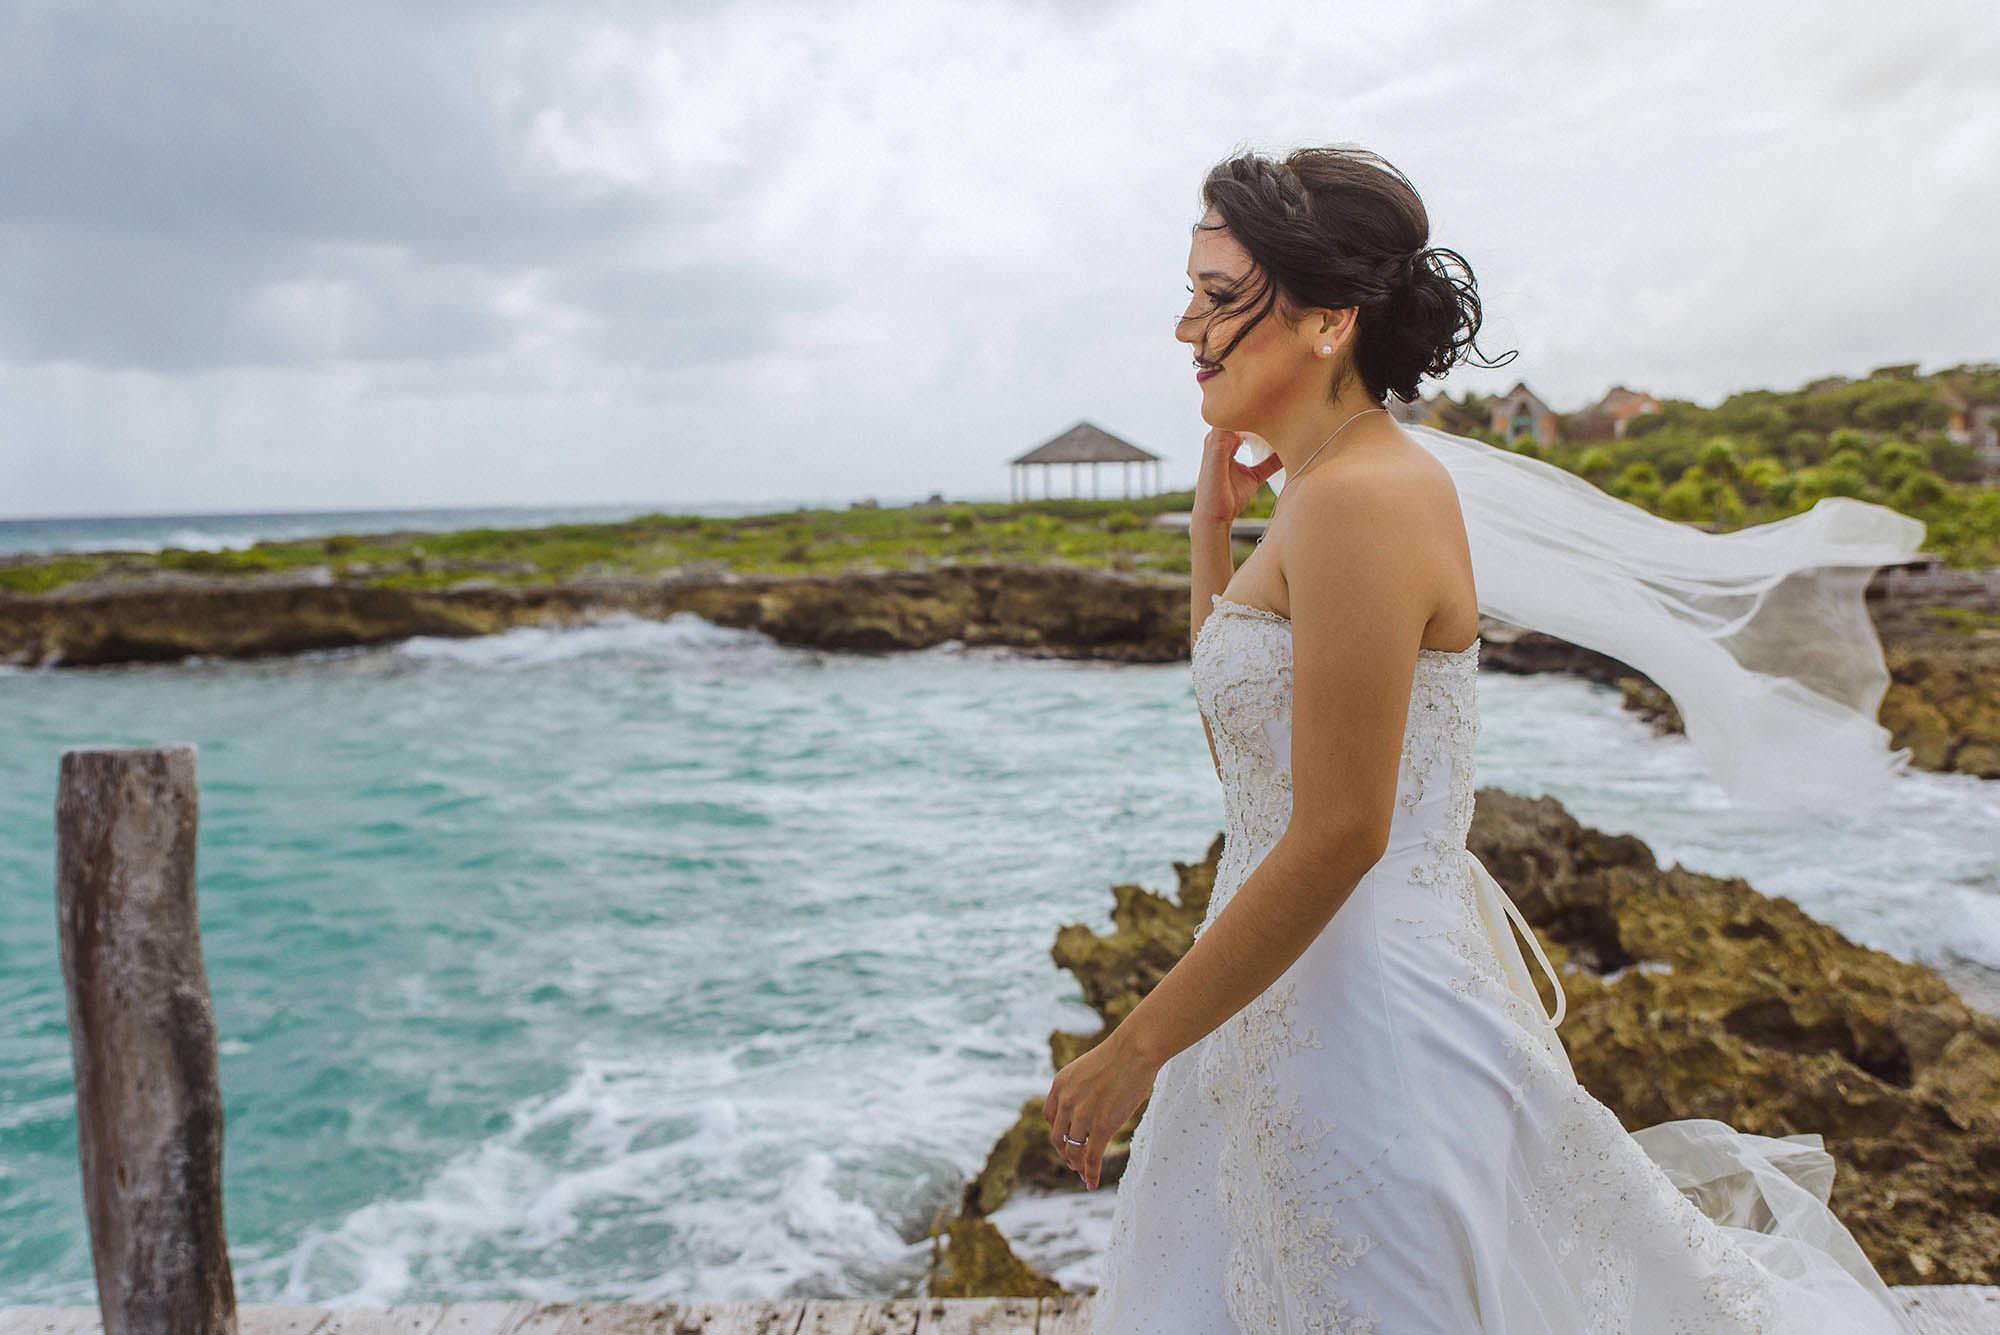 Wedding playa del carmen planner destination mexico magali espinosa18-WEB.jpg